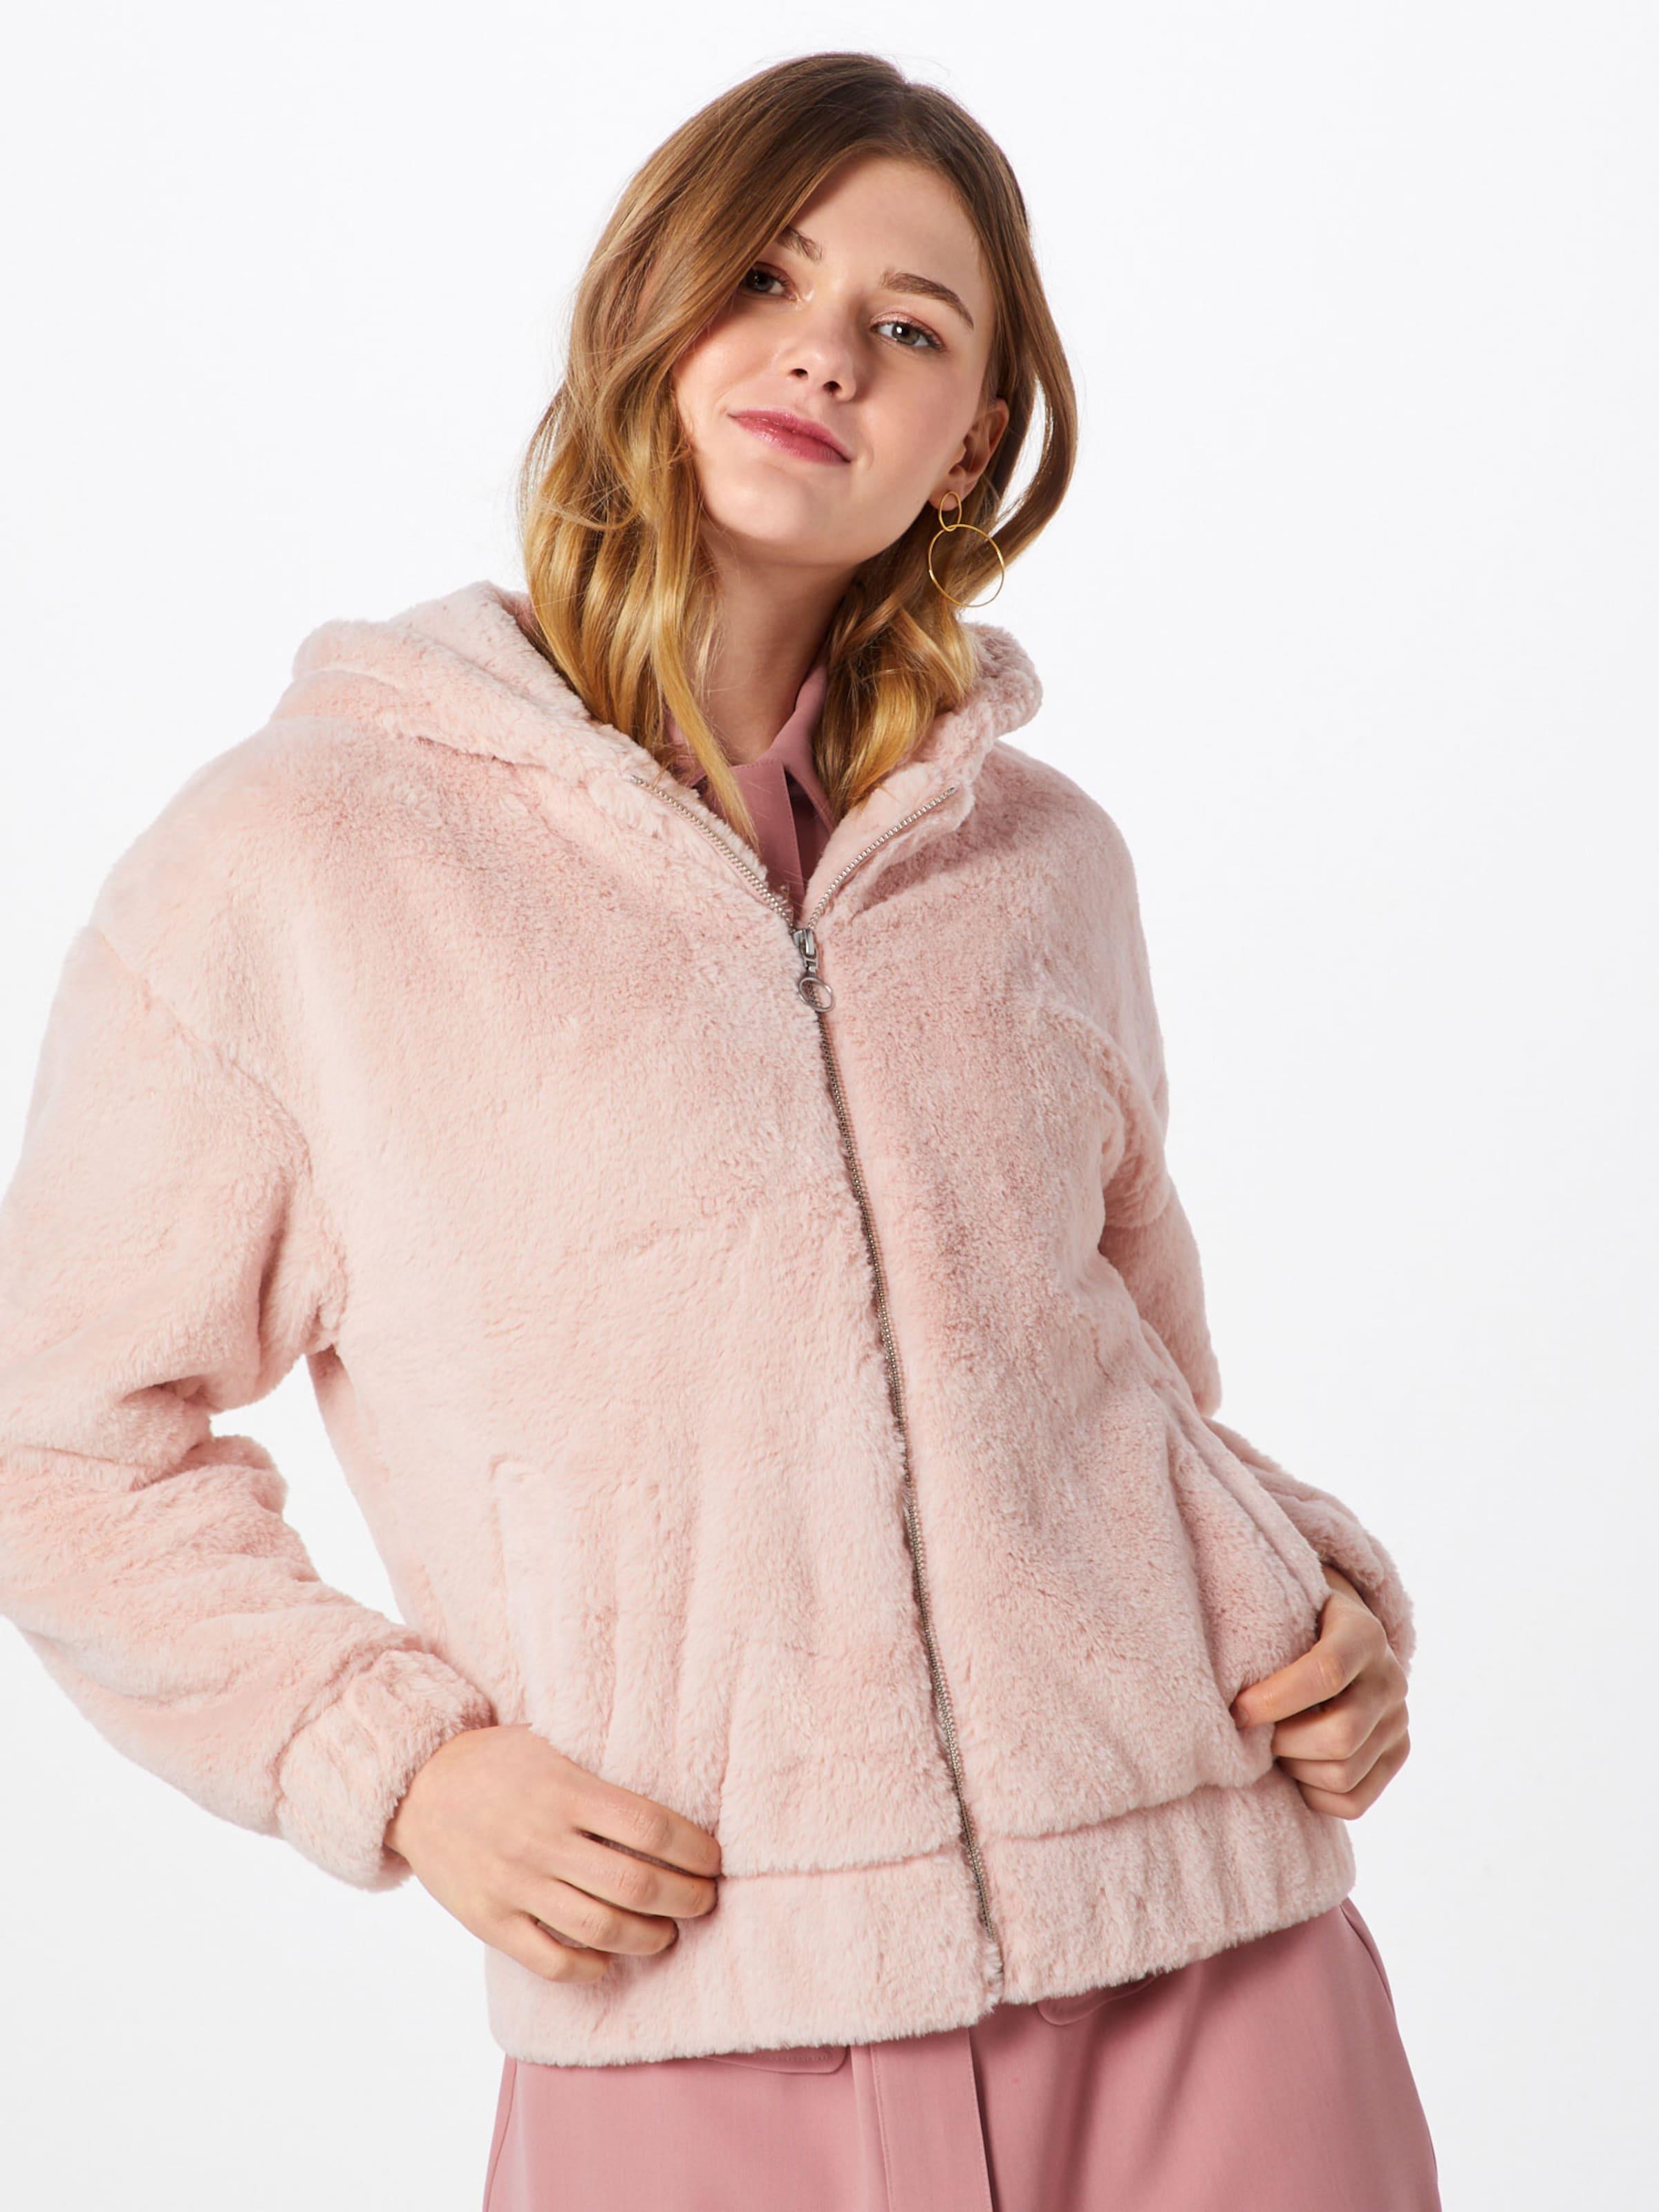 Jacket' Rosa Classics Teddy Urban Sweatjacke 'ladies In TcK1uFlJ3